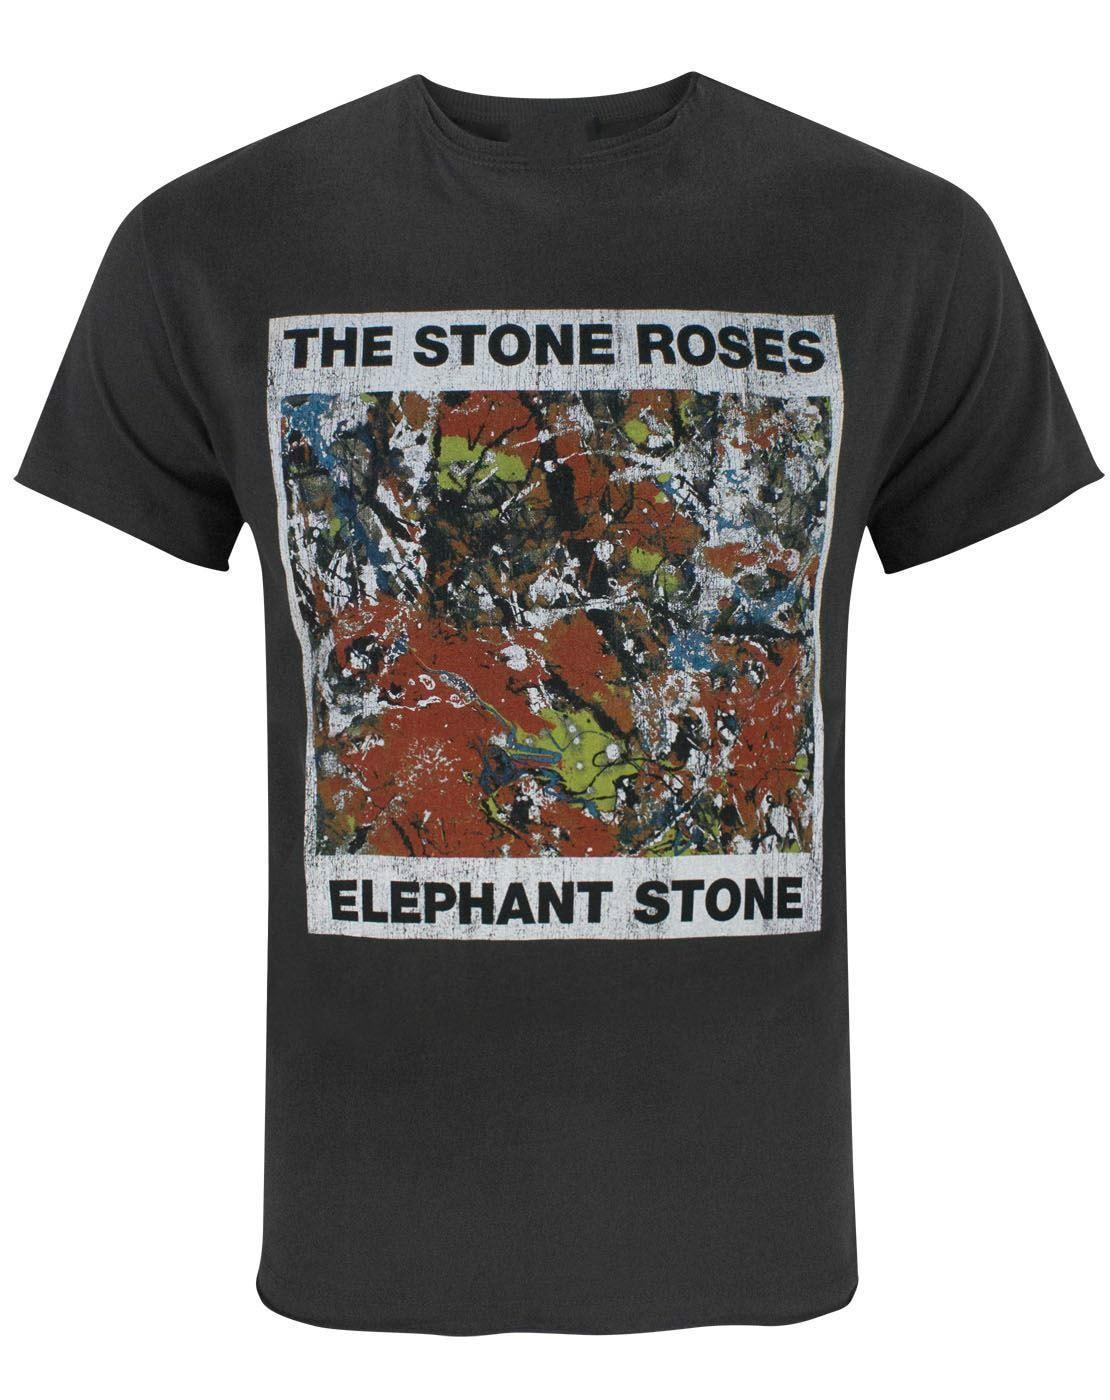 Amplified Stone Roses Elephant Stone Men's T-Shirt Tee Shirt Casual Short Sleeve Summer Cotton T-Shirt Fashion Trend